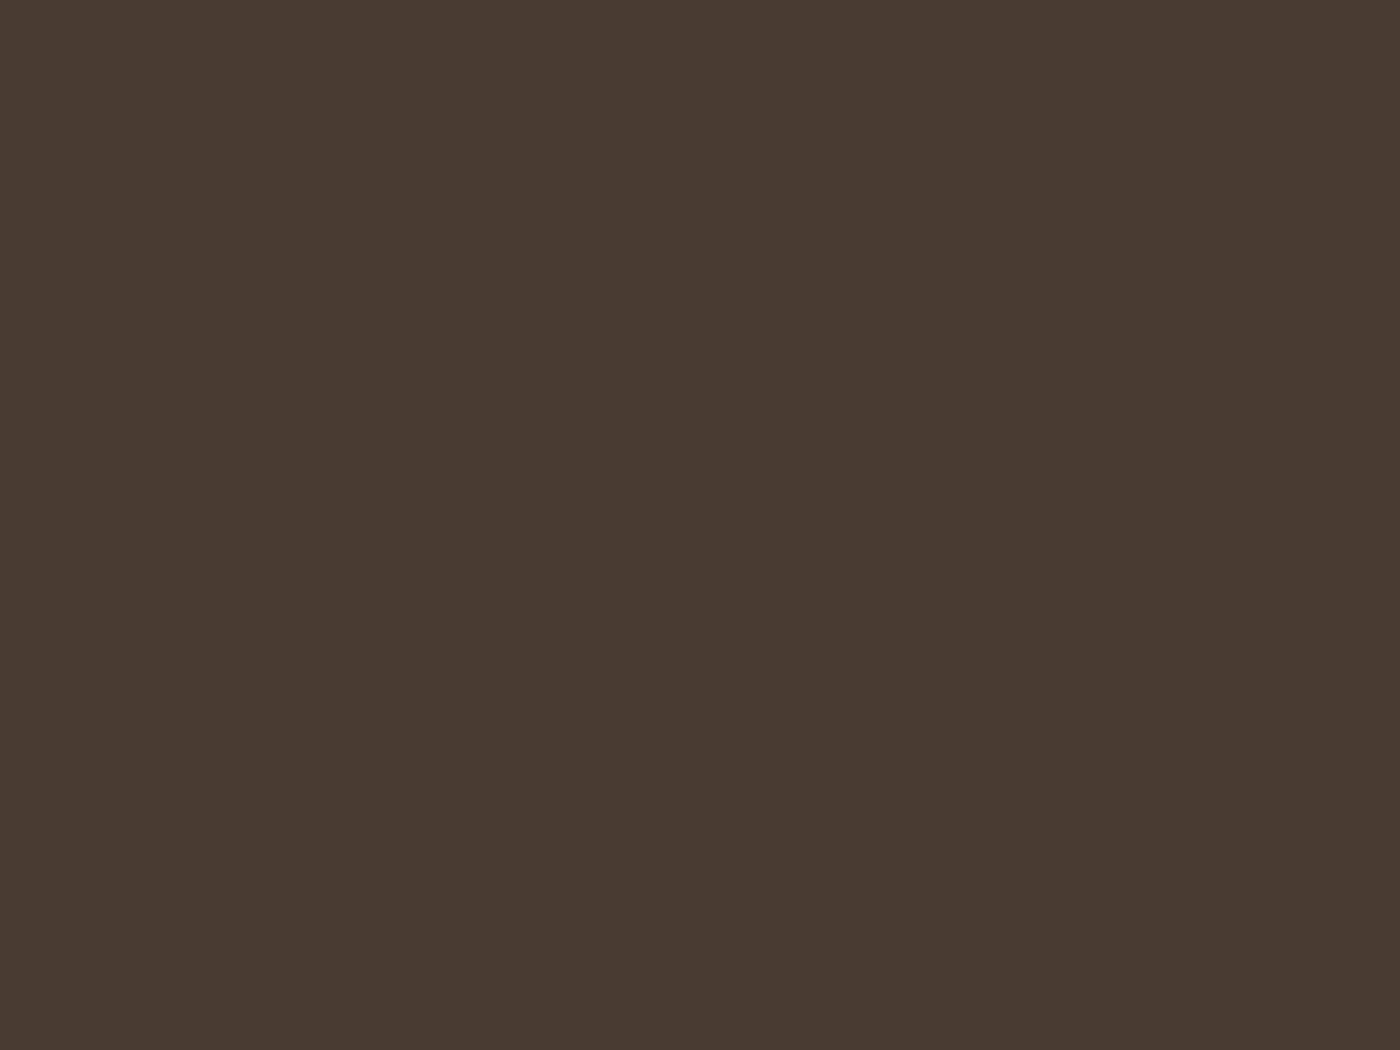 1400x1050 Dark Lava Solid Color Background